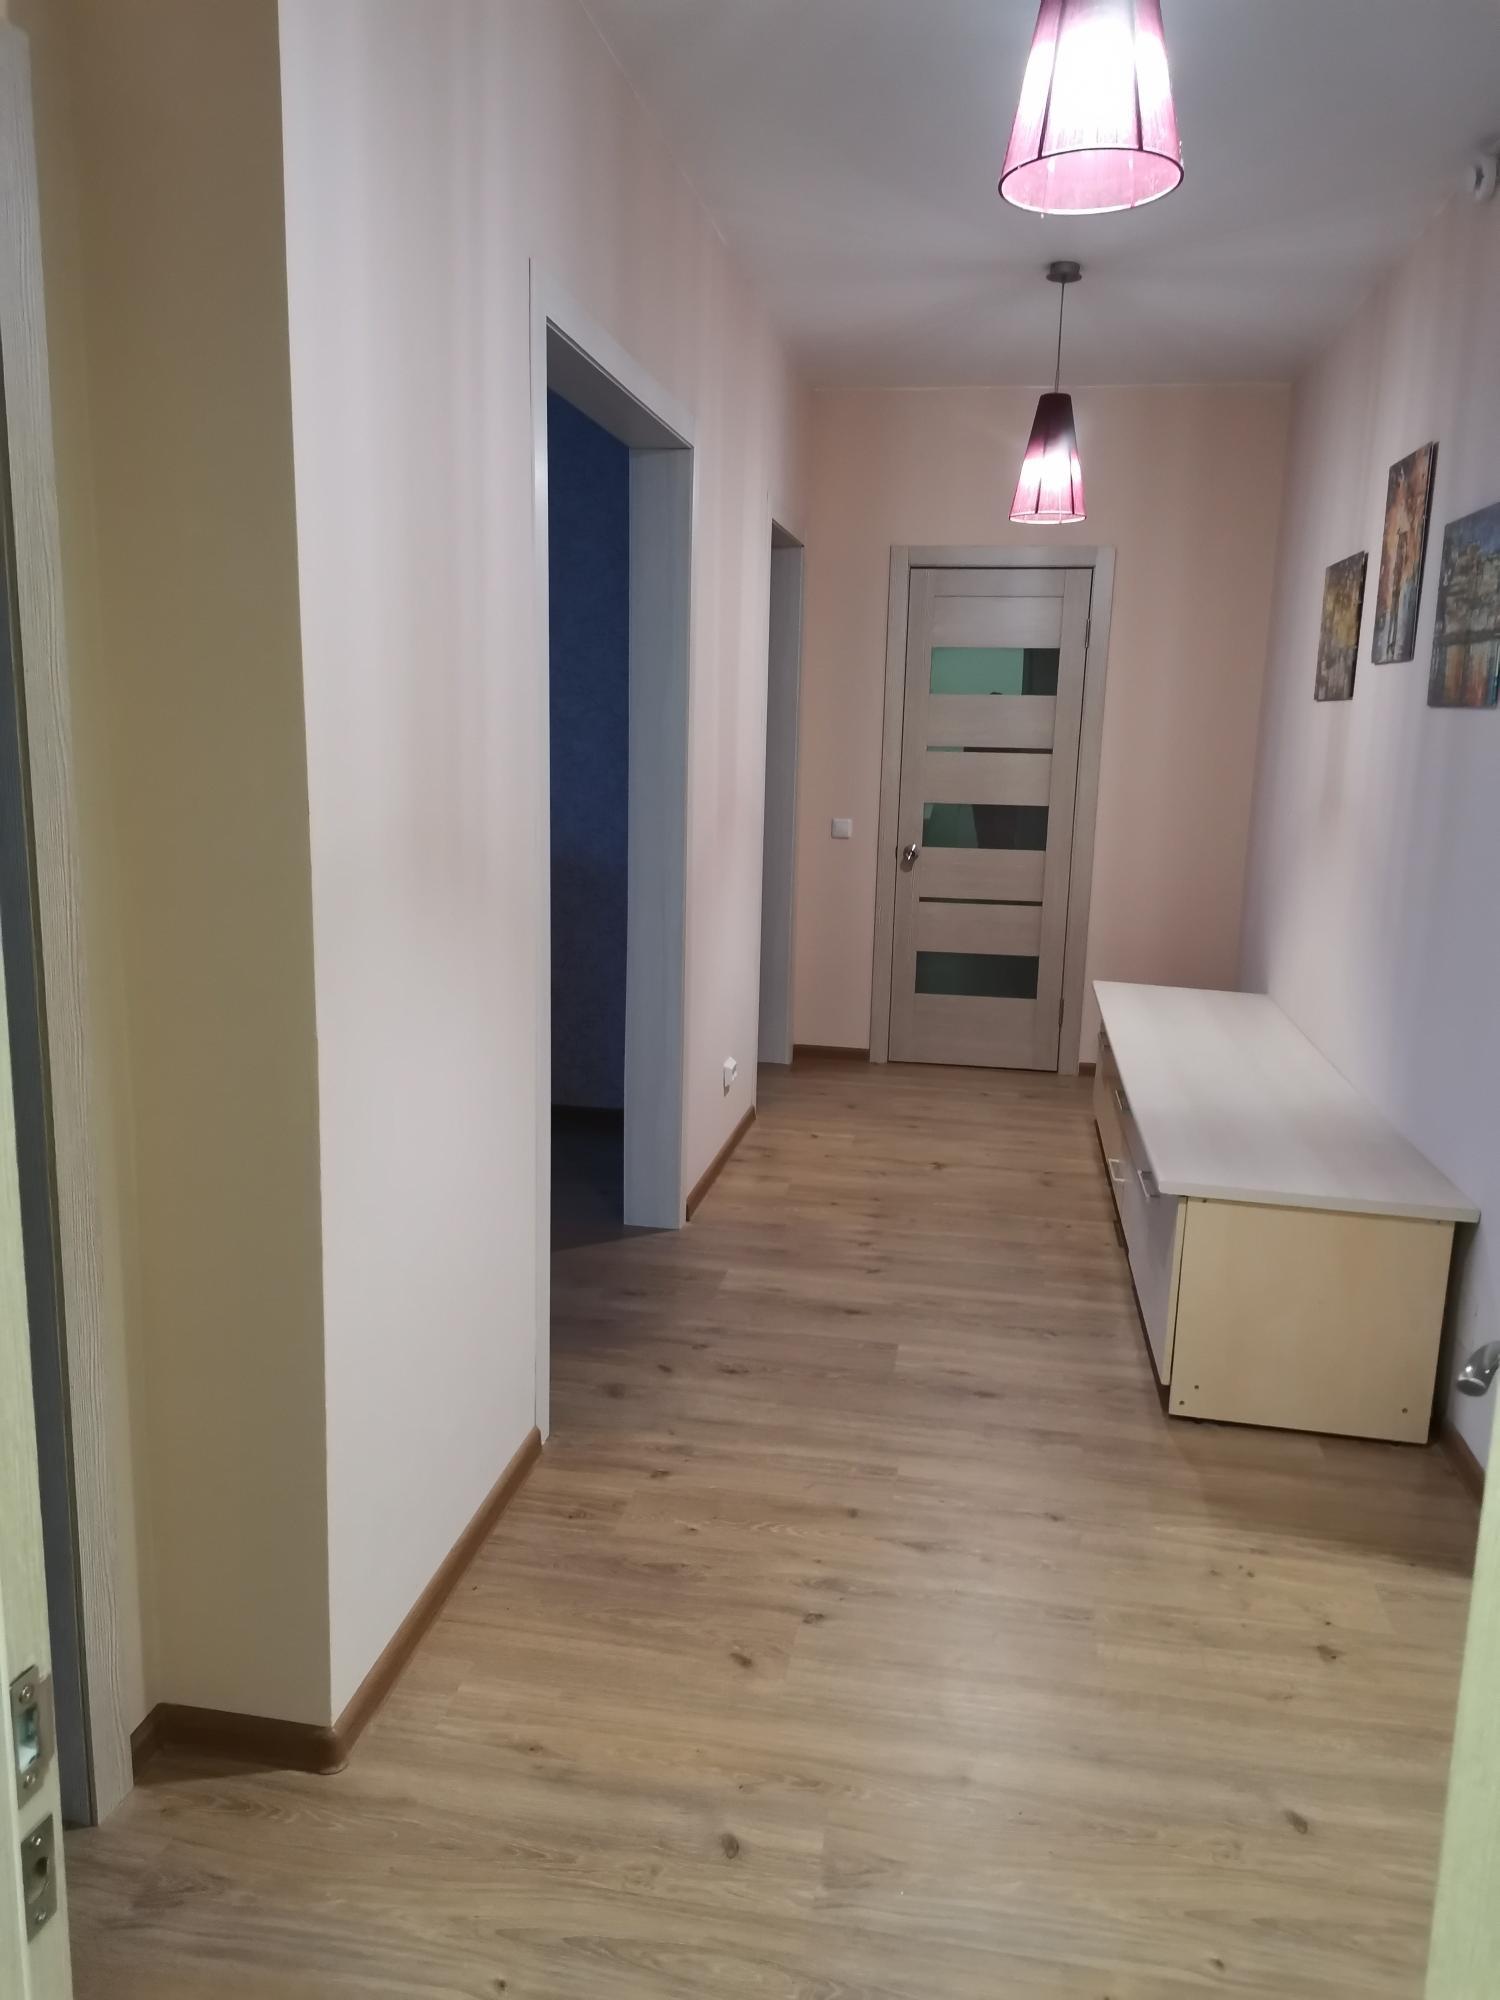 2к квартира улица Партизана Железняка, 48 | 25000 | аренда в Красноярске фото 9